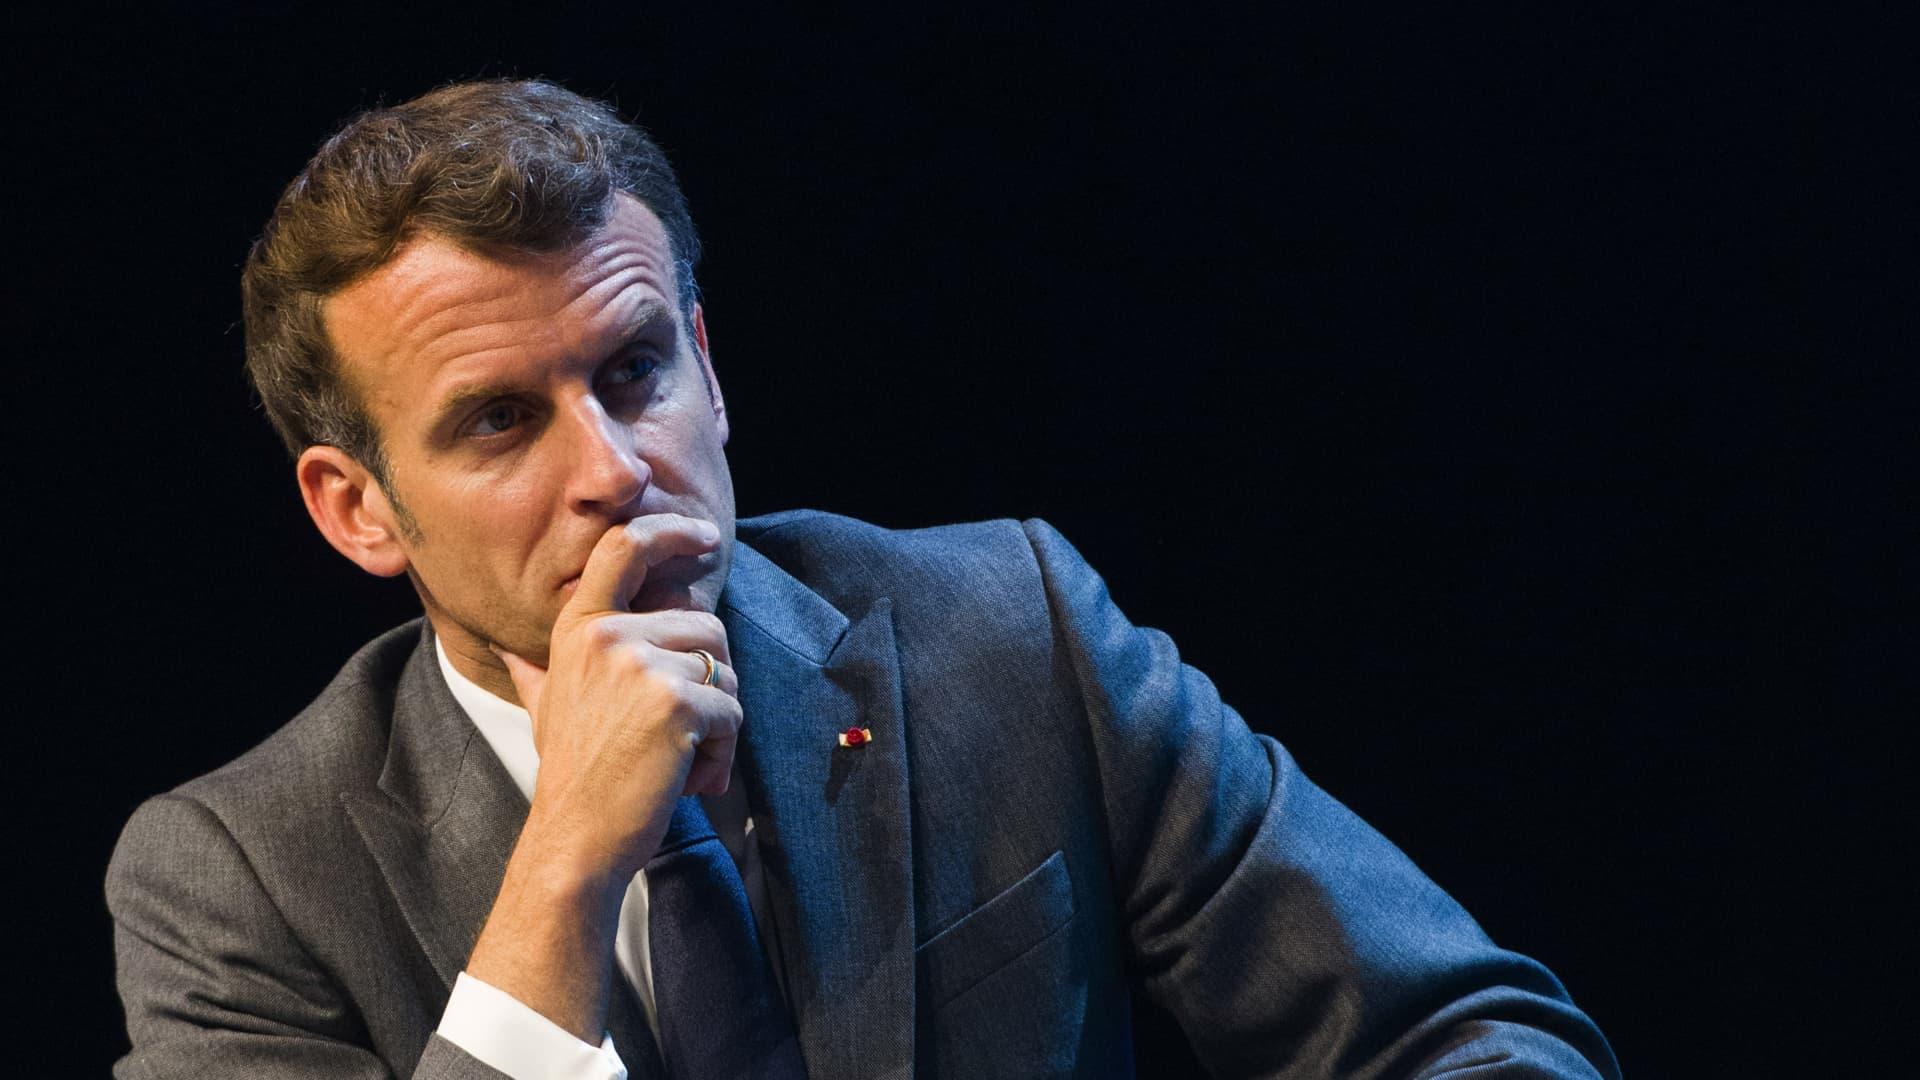 Emmanuel Macron, Frances president, pauses at the Viva Technology conference at Porte de Versailles exhibition center in Paris, France.